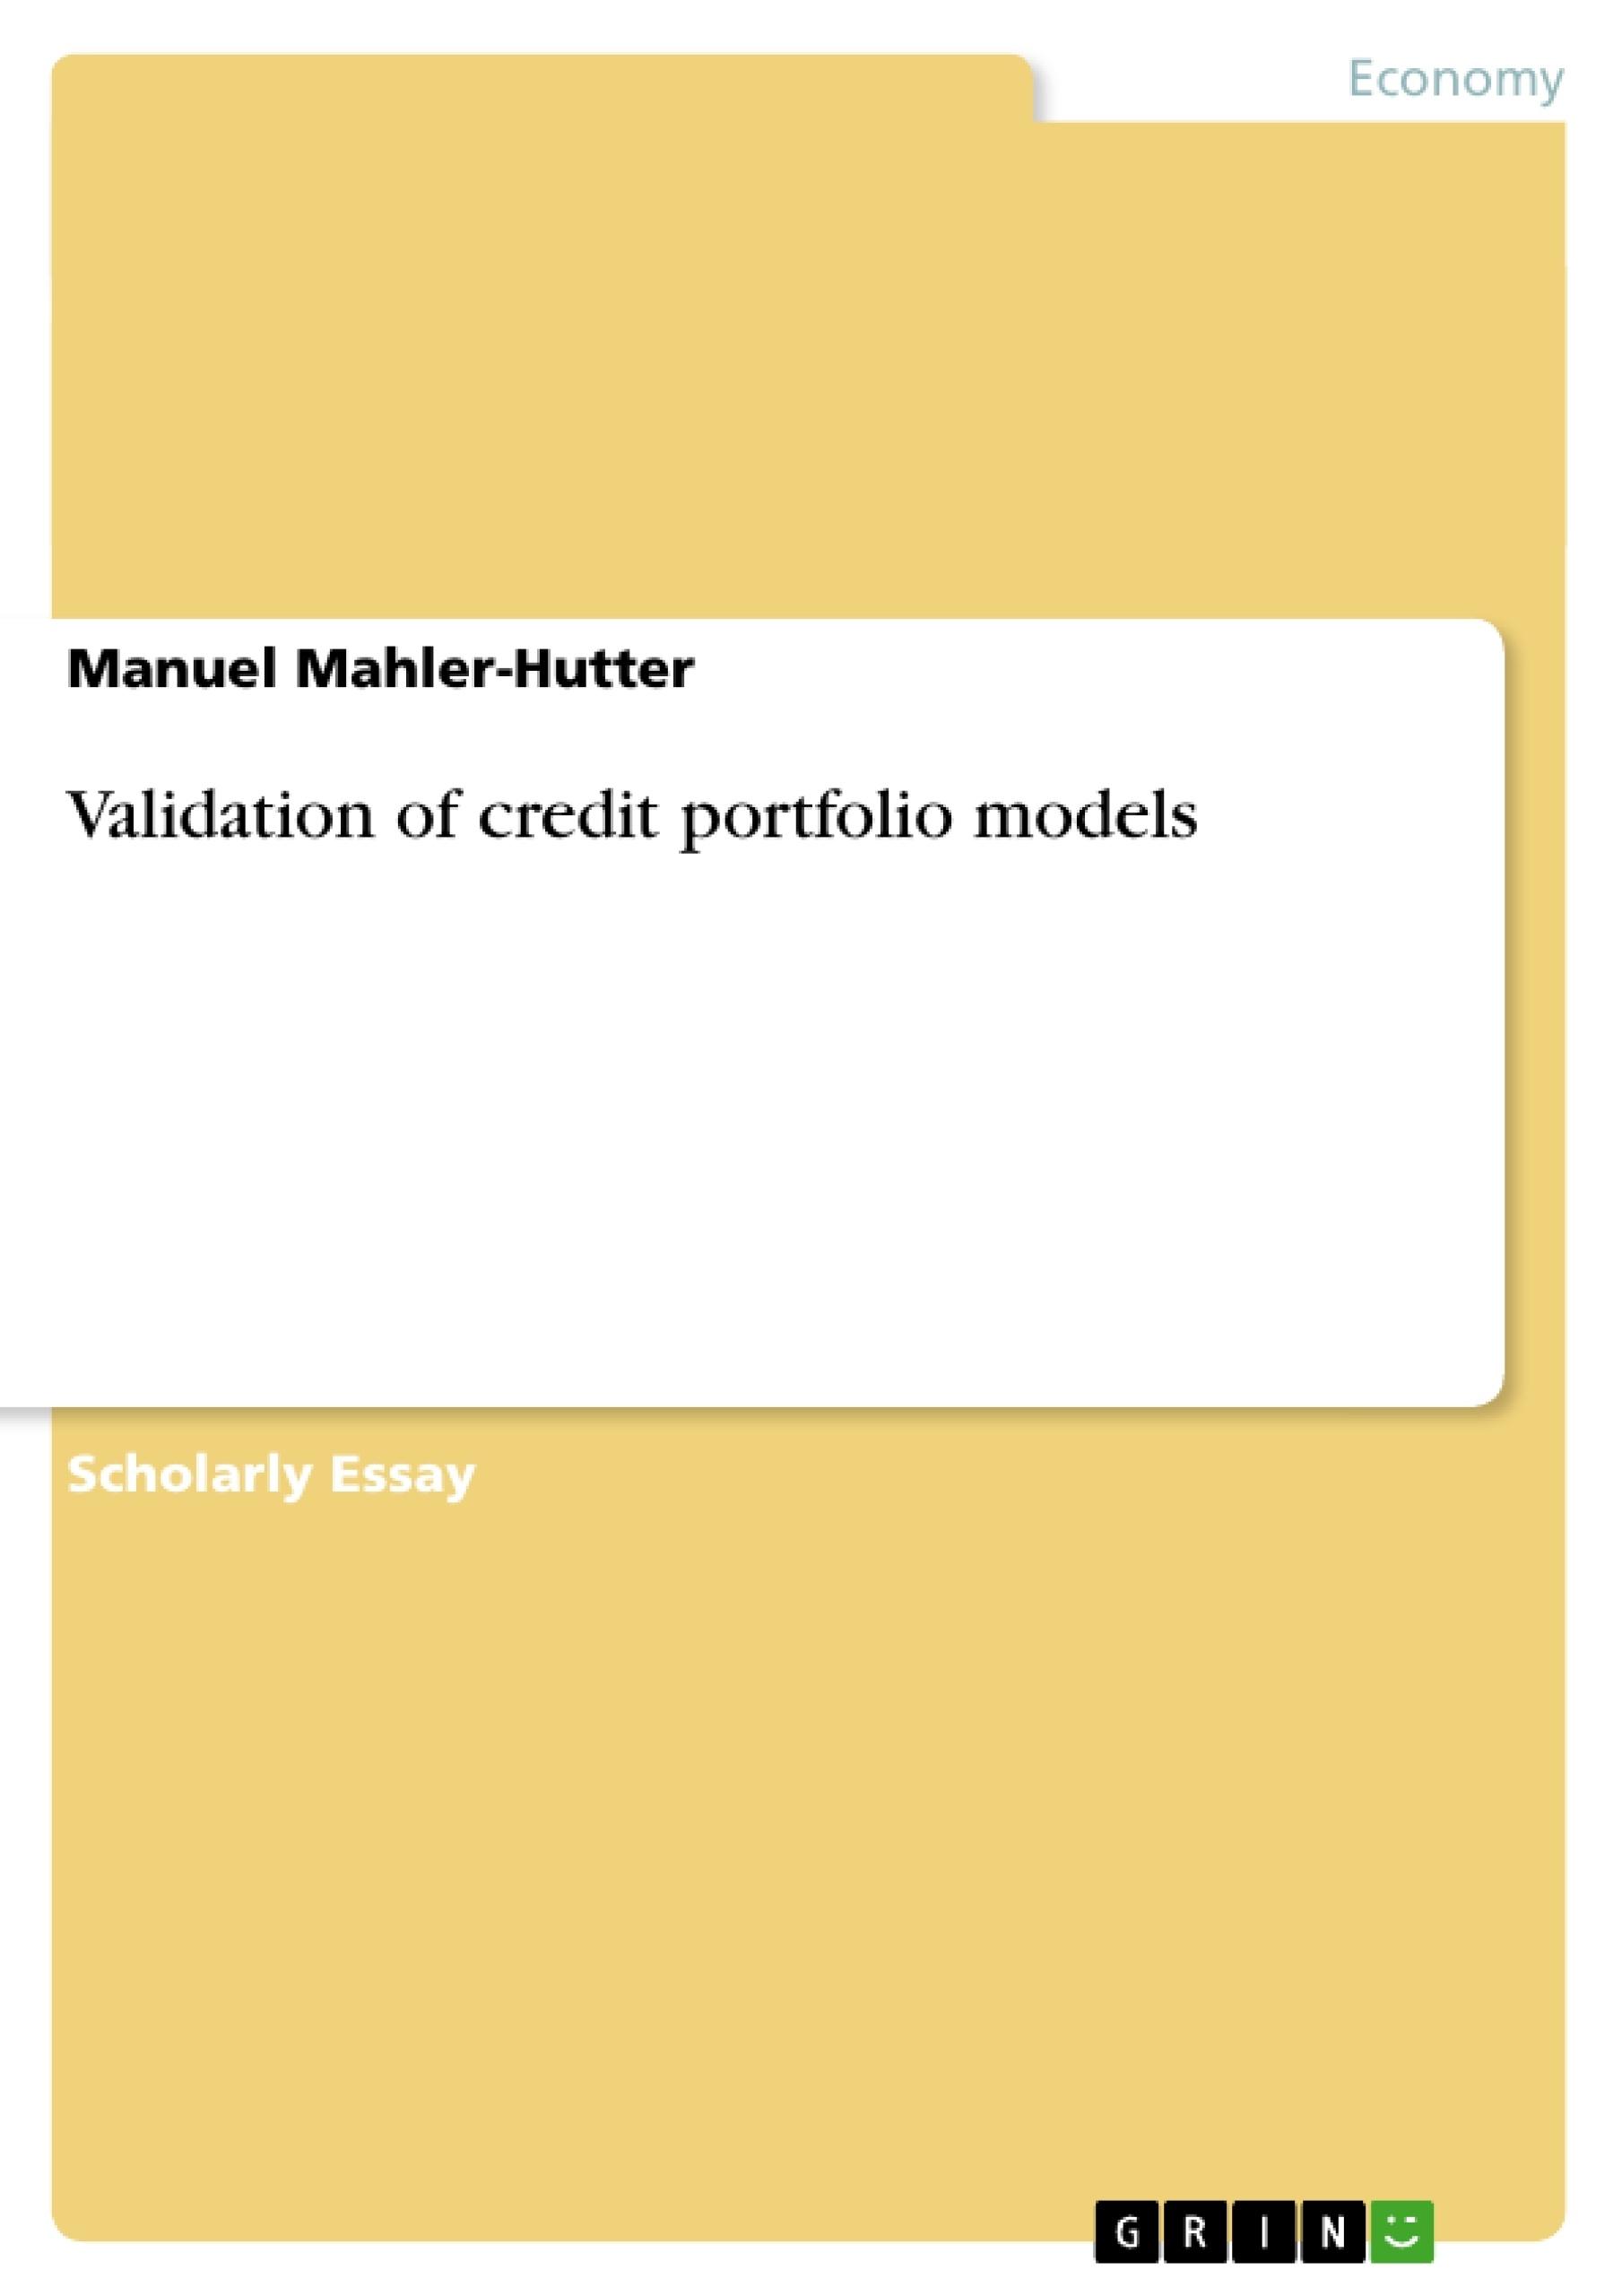 Title: Validation of credit portfolio models